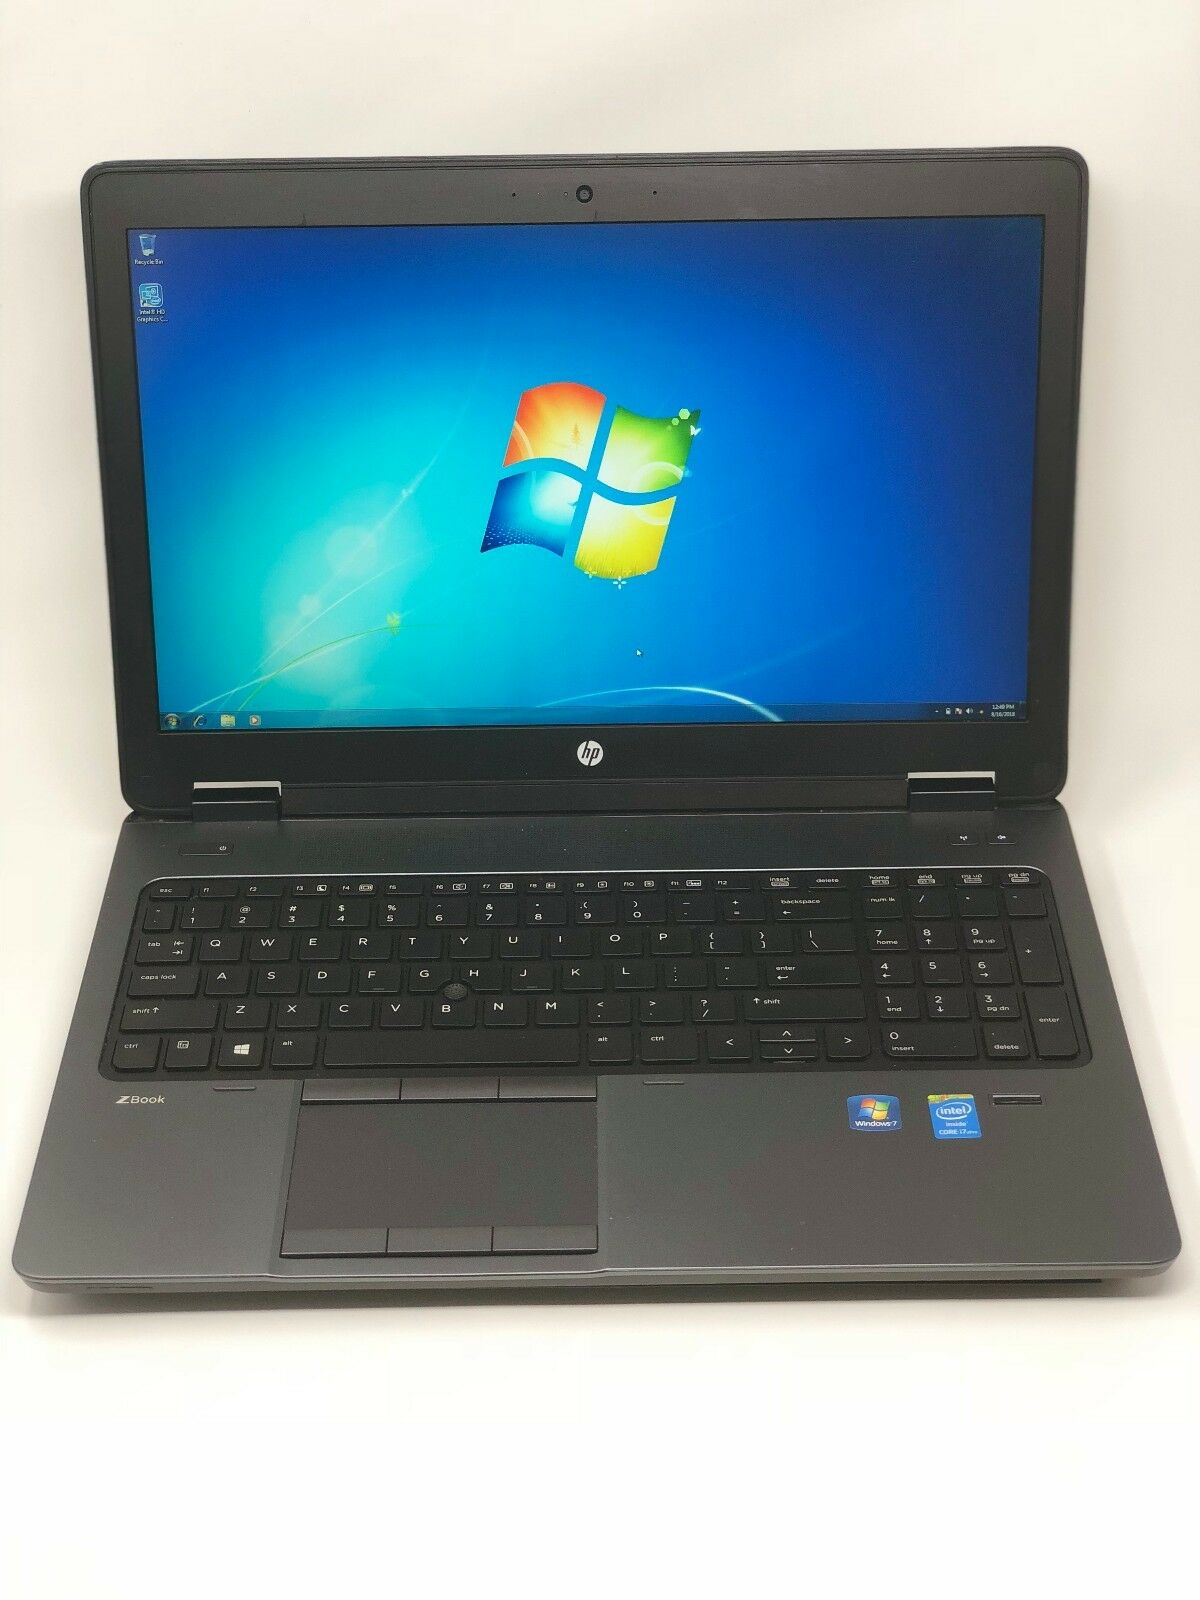 HP ZBook 15 Core i7-4800MQ 2.7GHz 32GB 500GB Win 7 K2100m 1080p Gaming Laptop